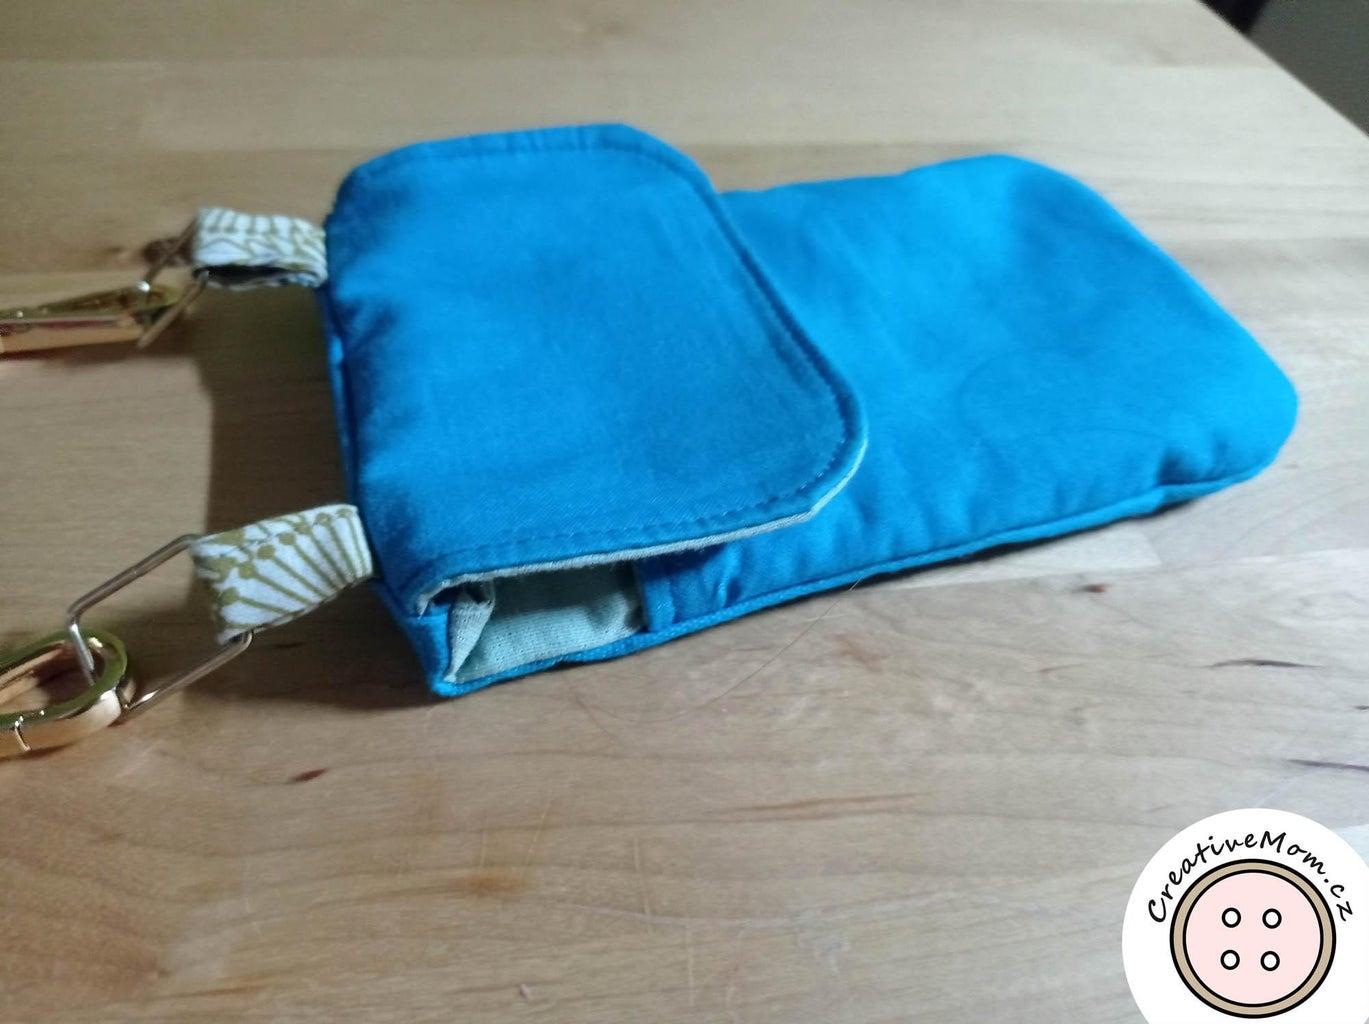 Attaching Velcro